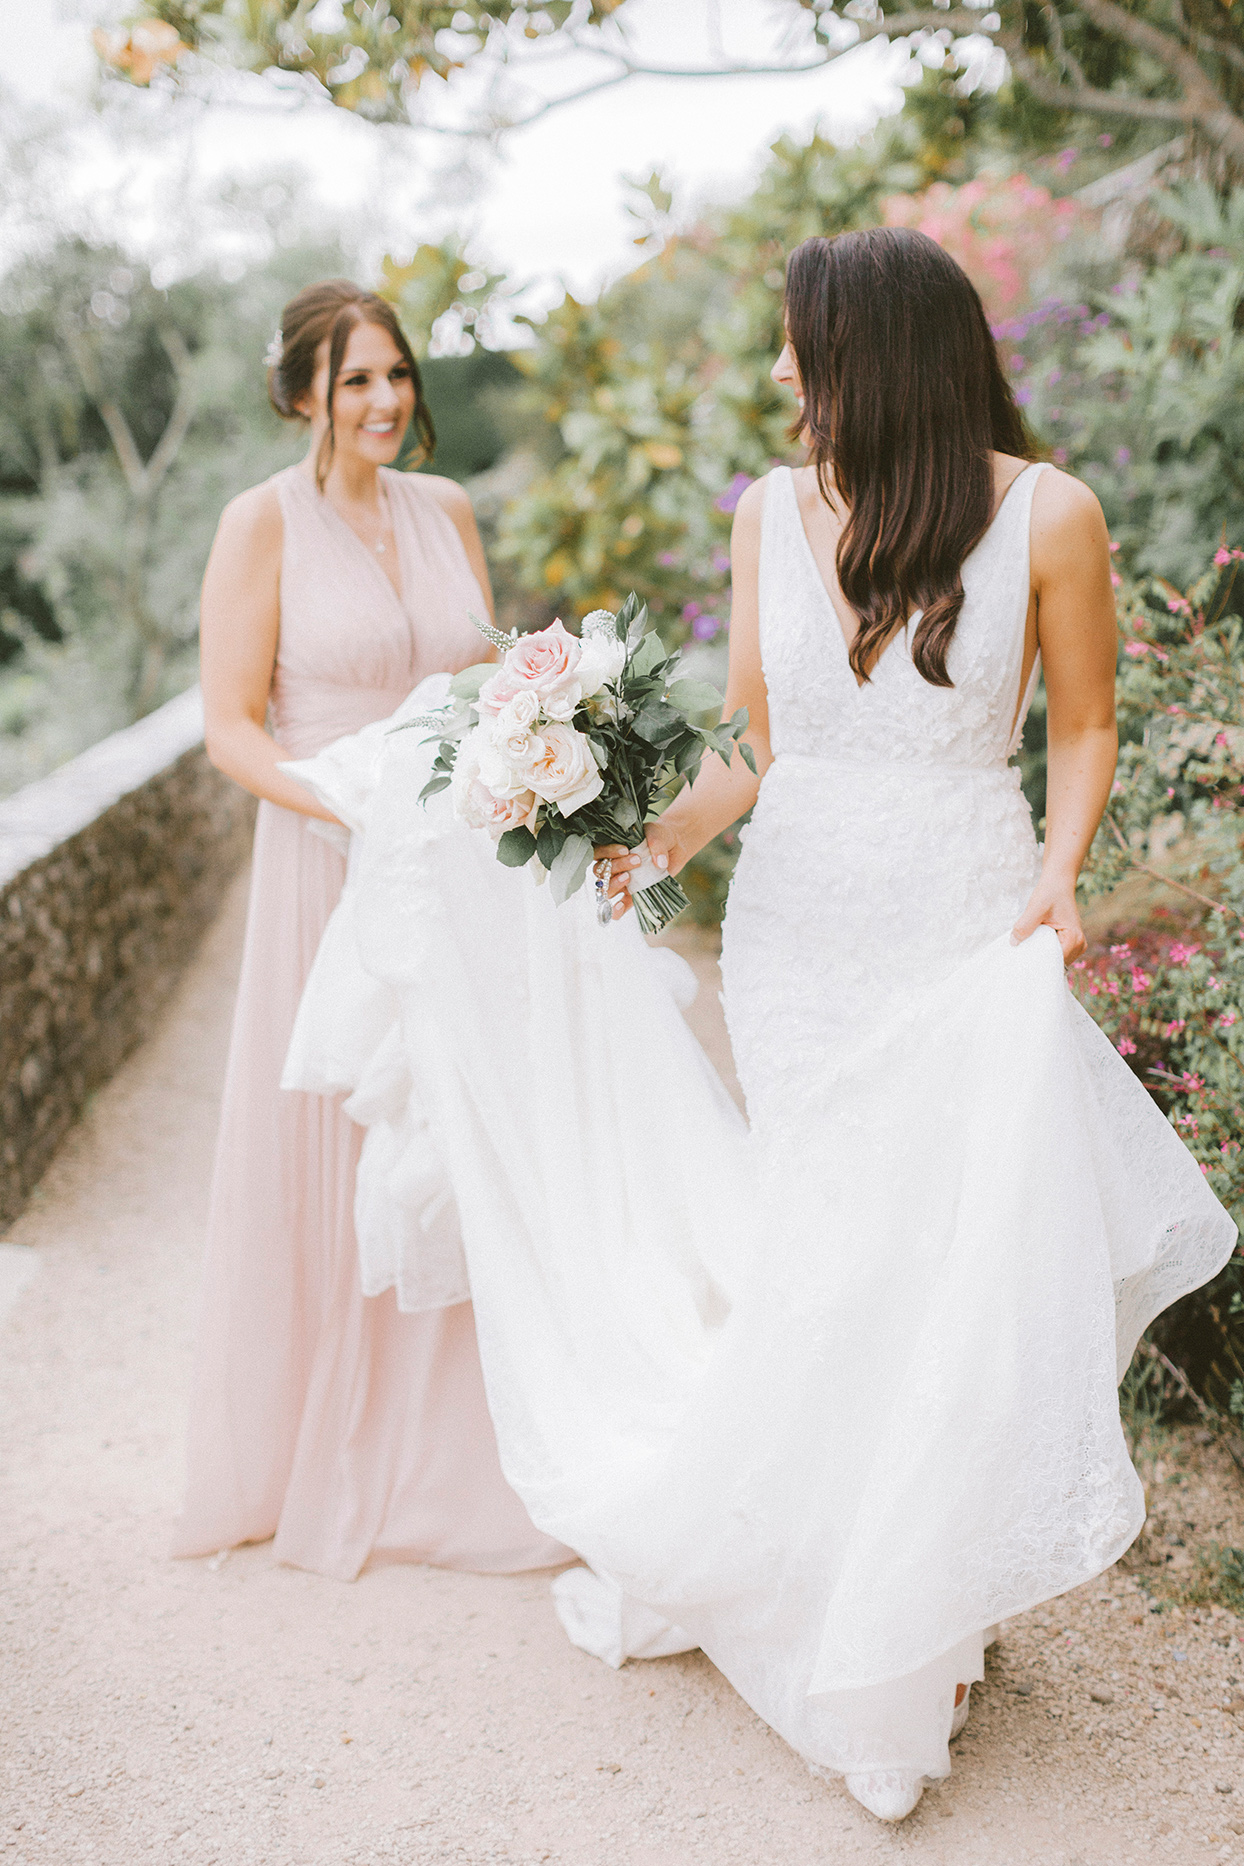 bridesmaid holding up bride's dress train on gravel path